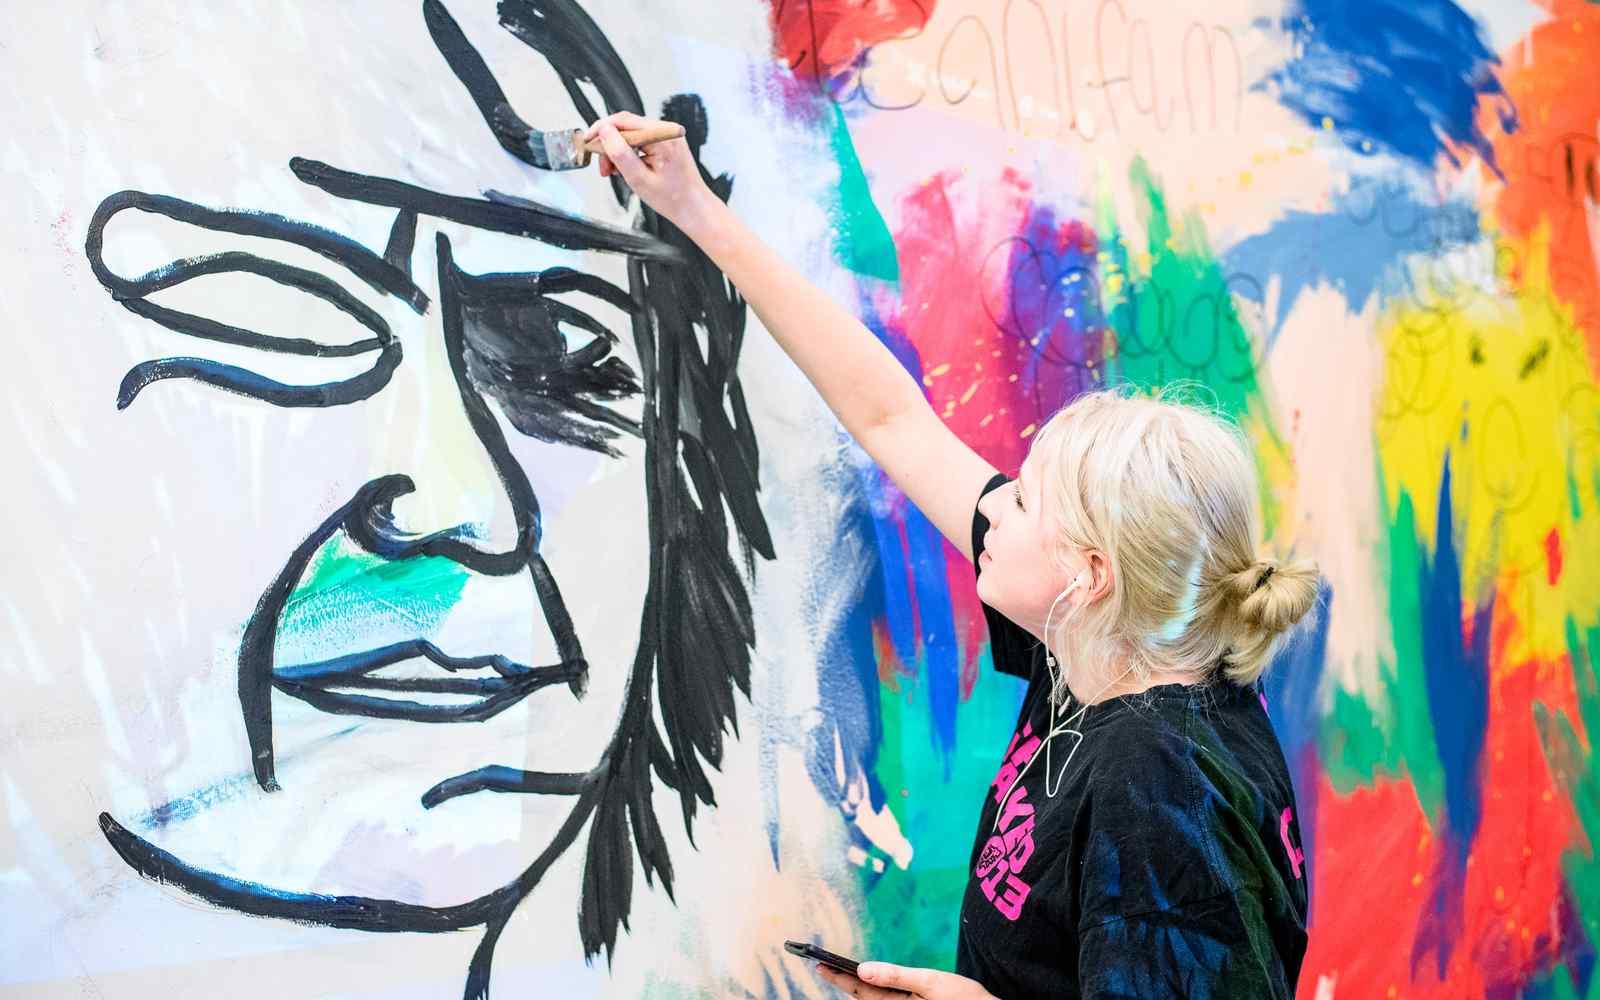 A student installing artwork